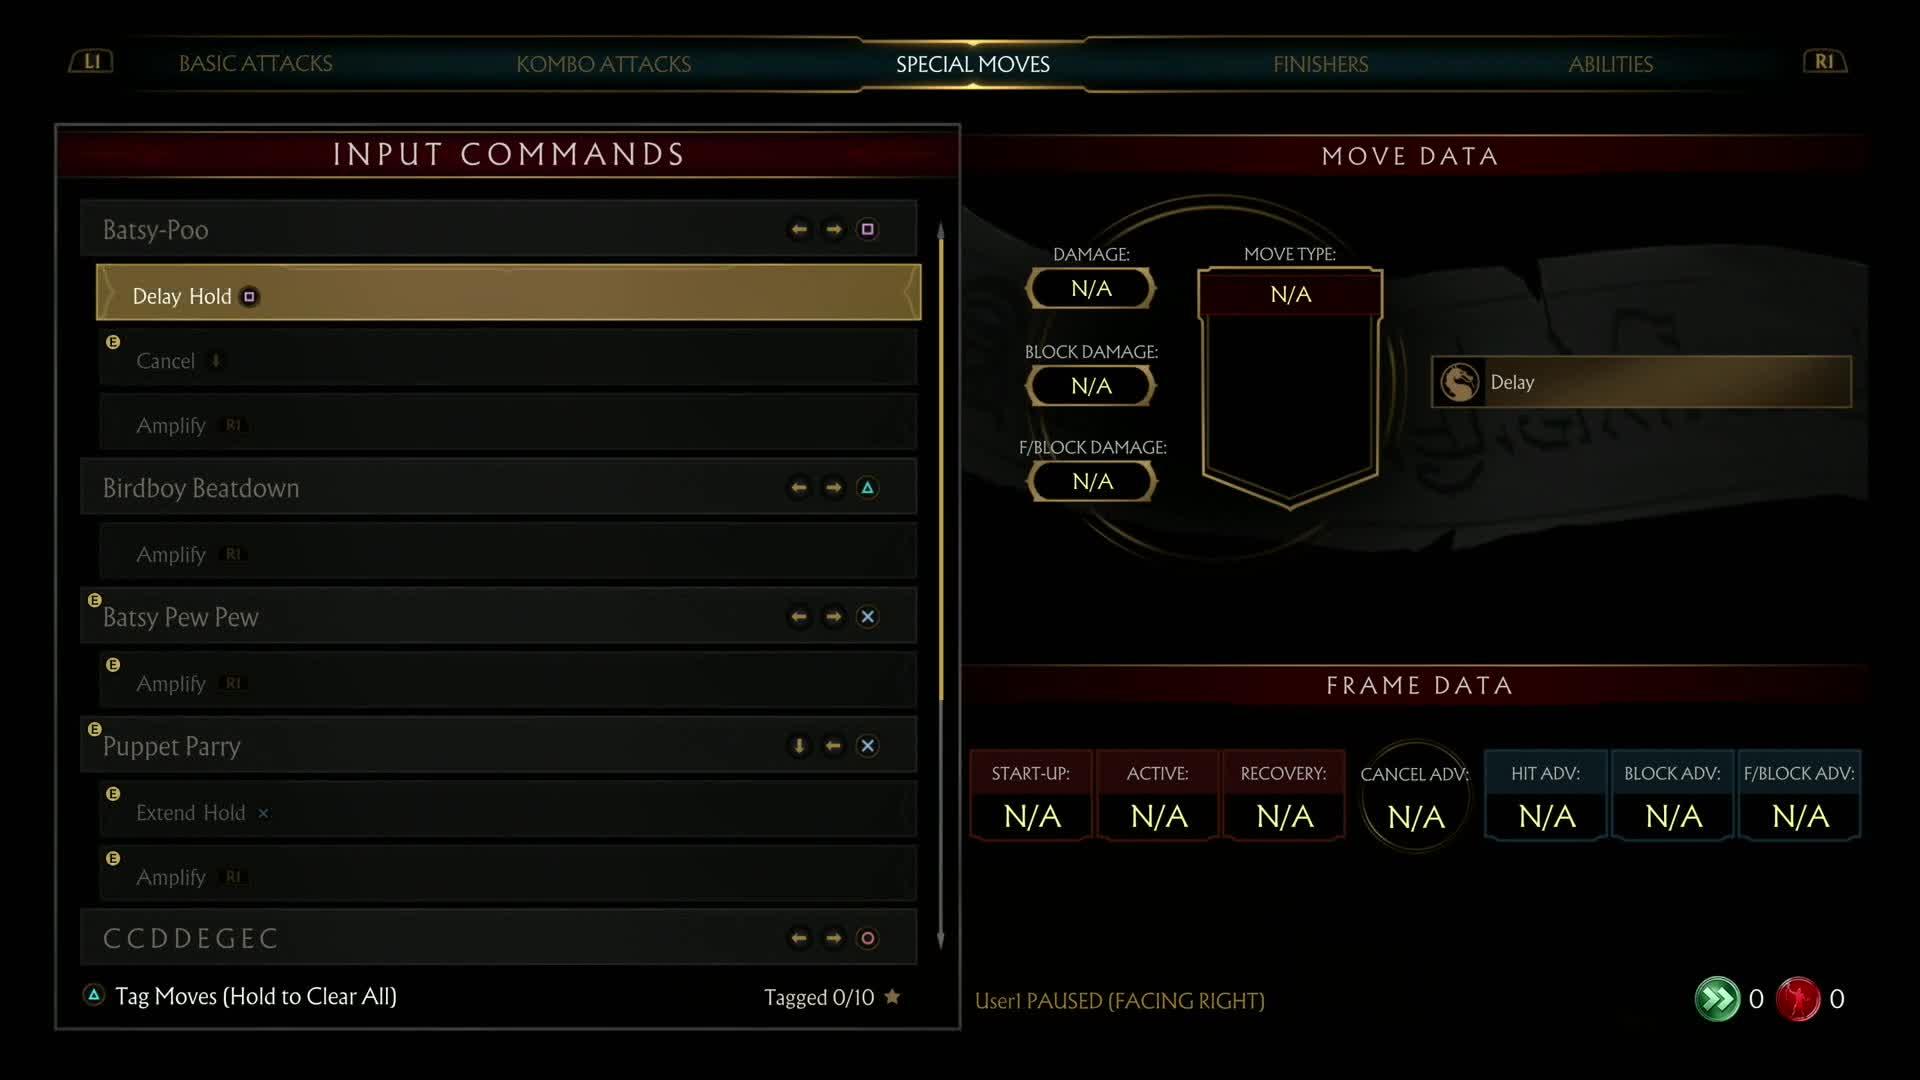 Mortal Kombat 11 Joker Gameplay screen capture